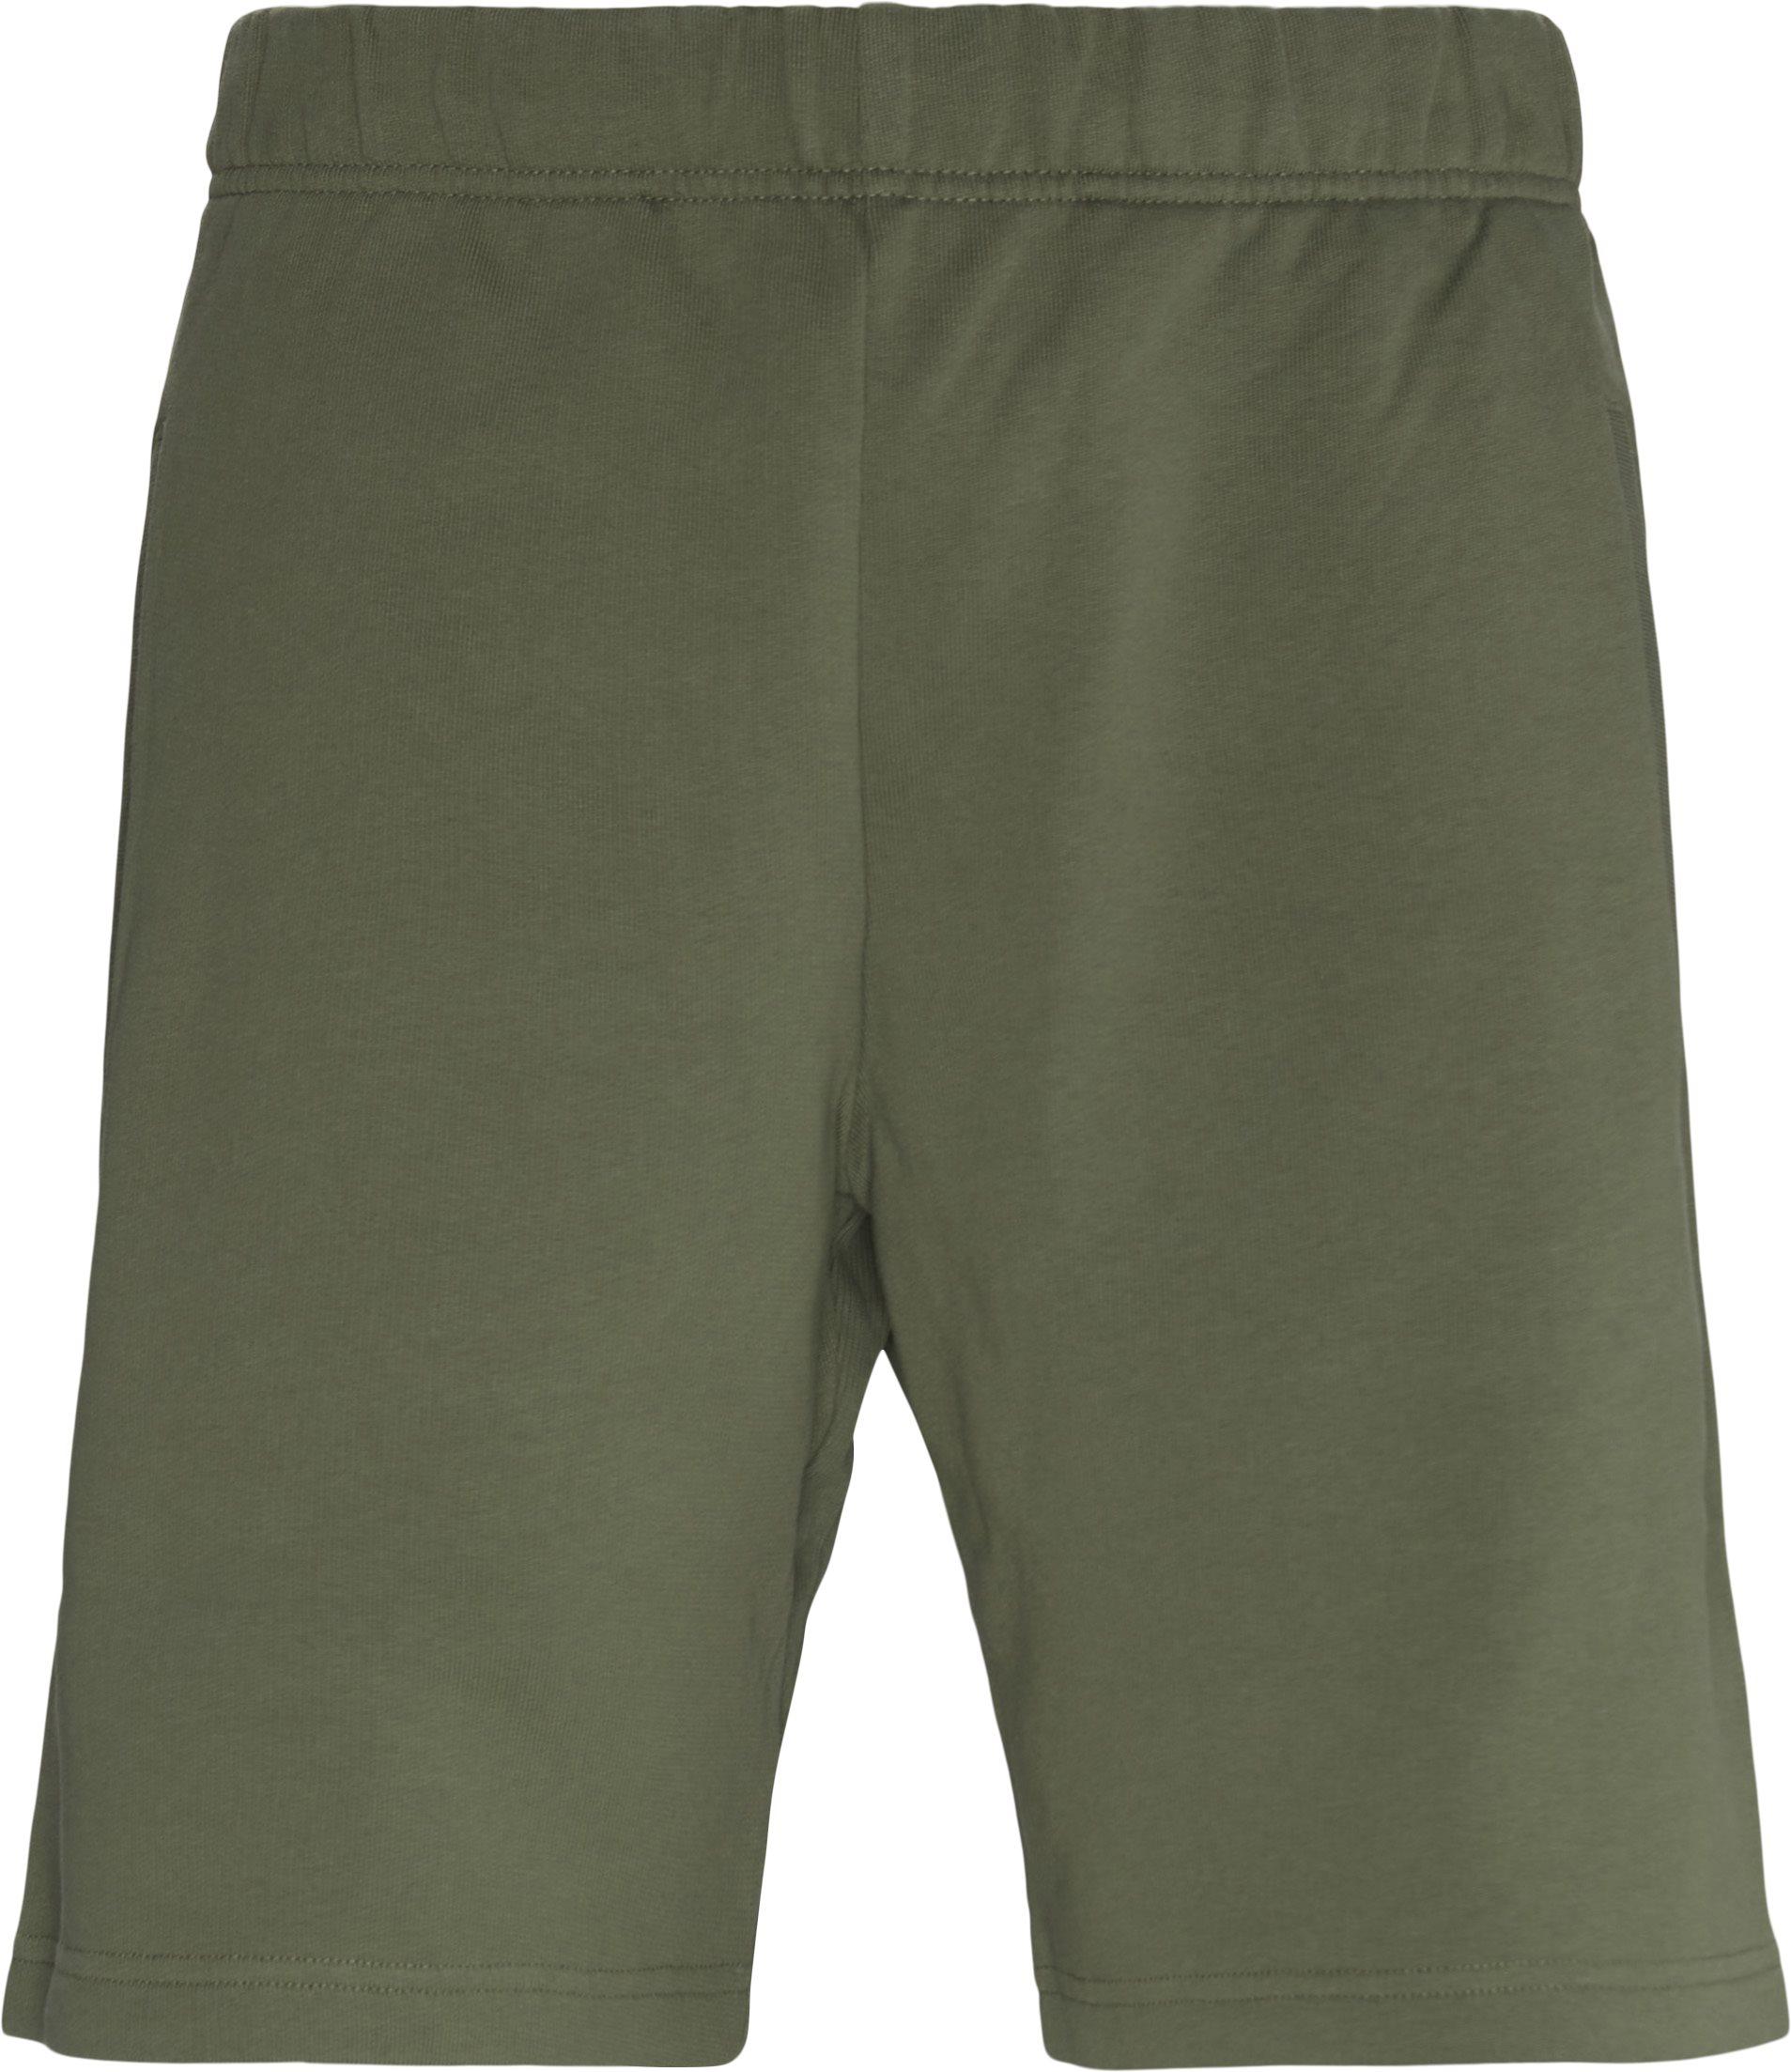 Shorts - Regular fit - Green